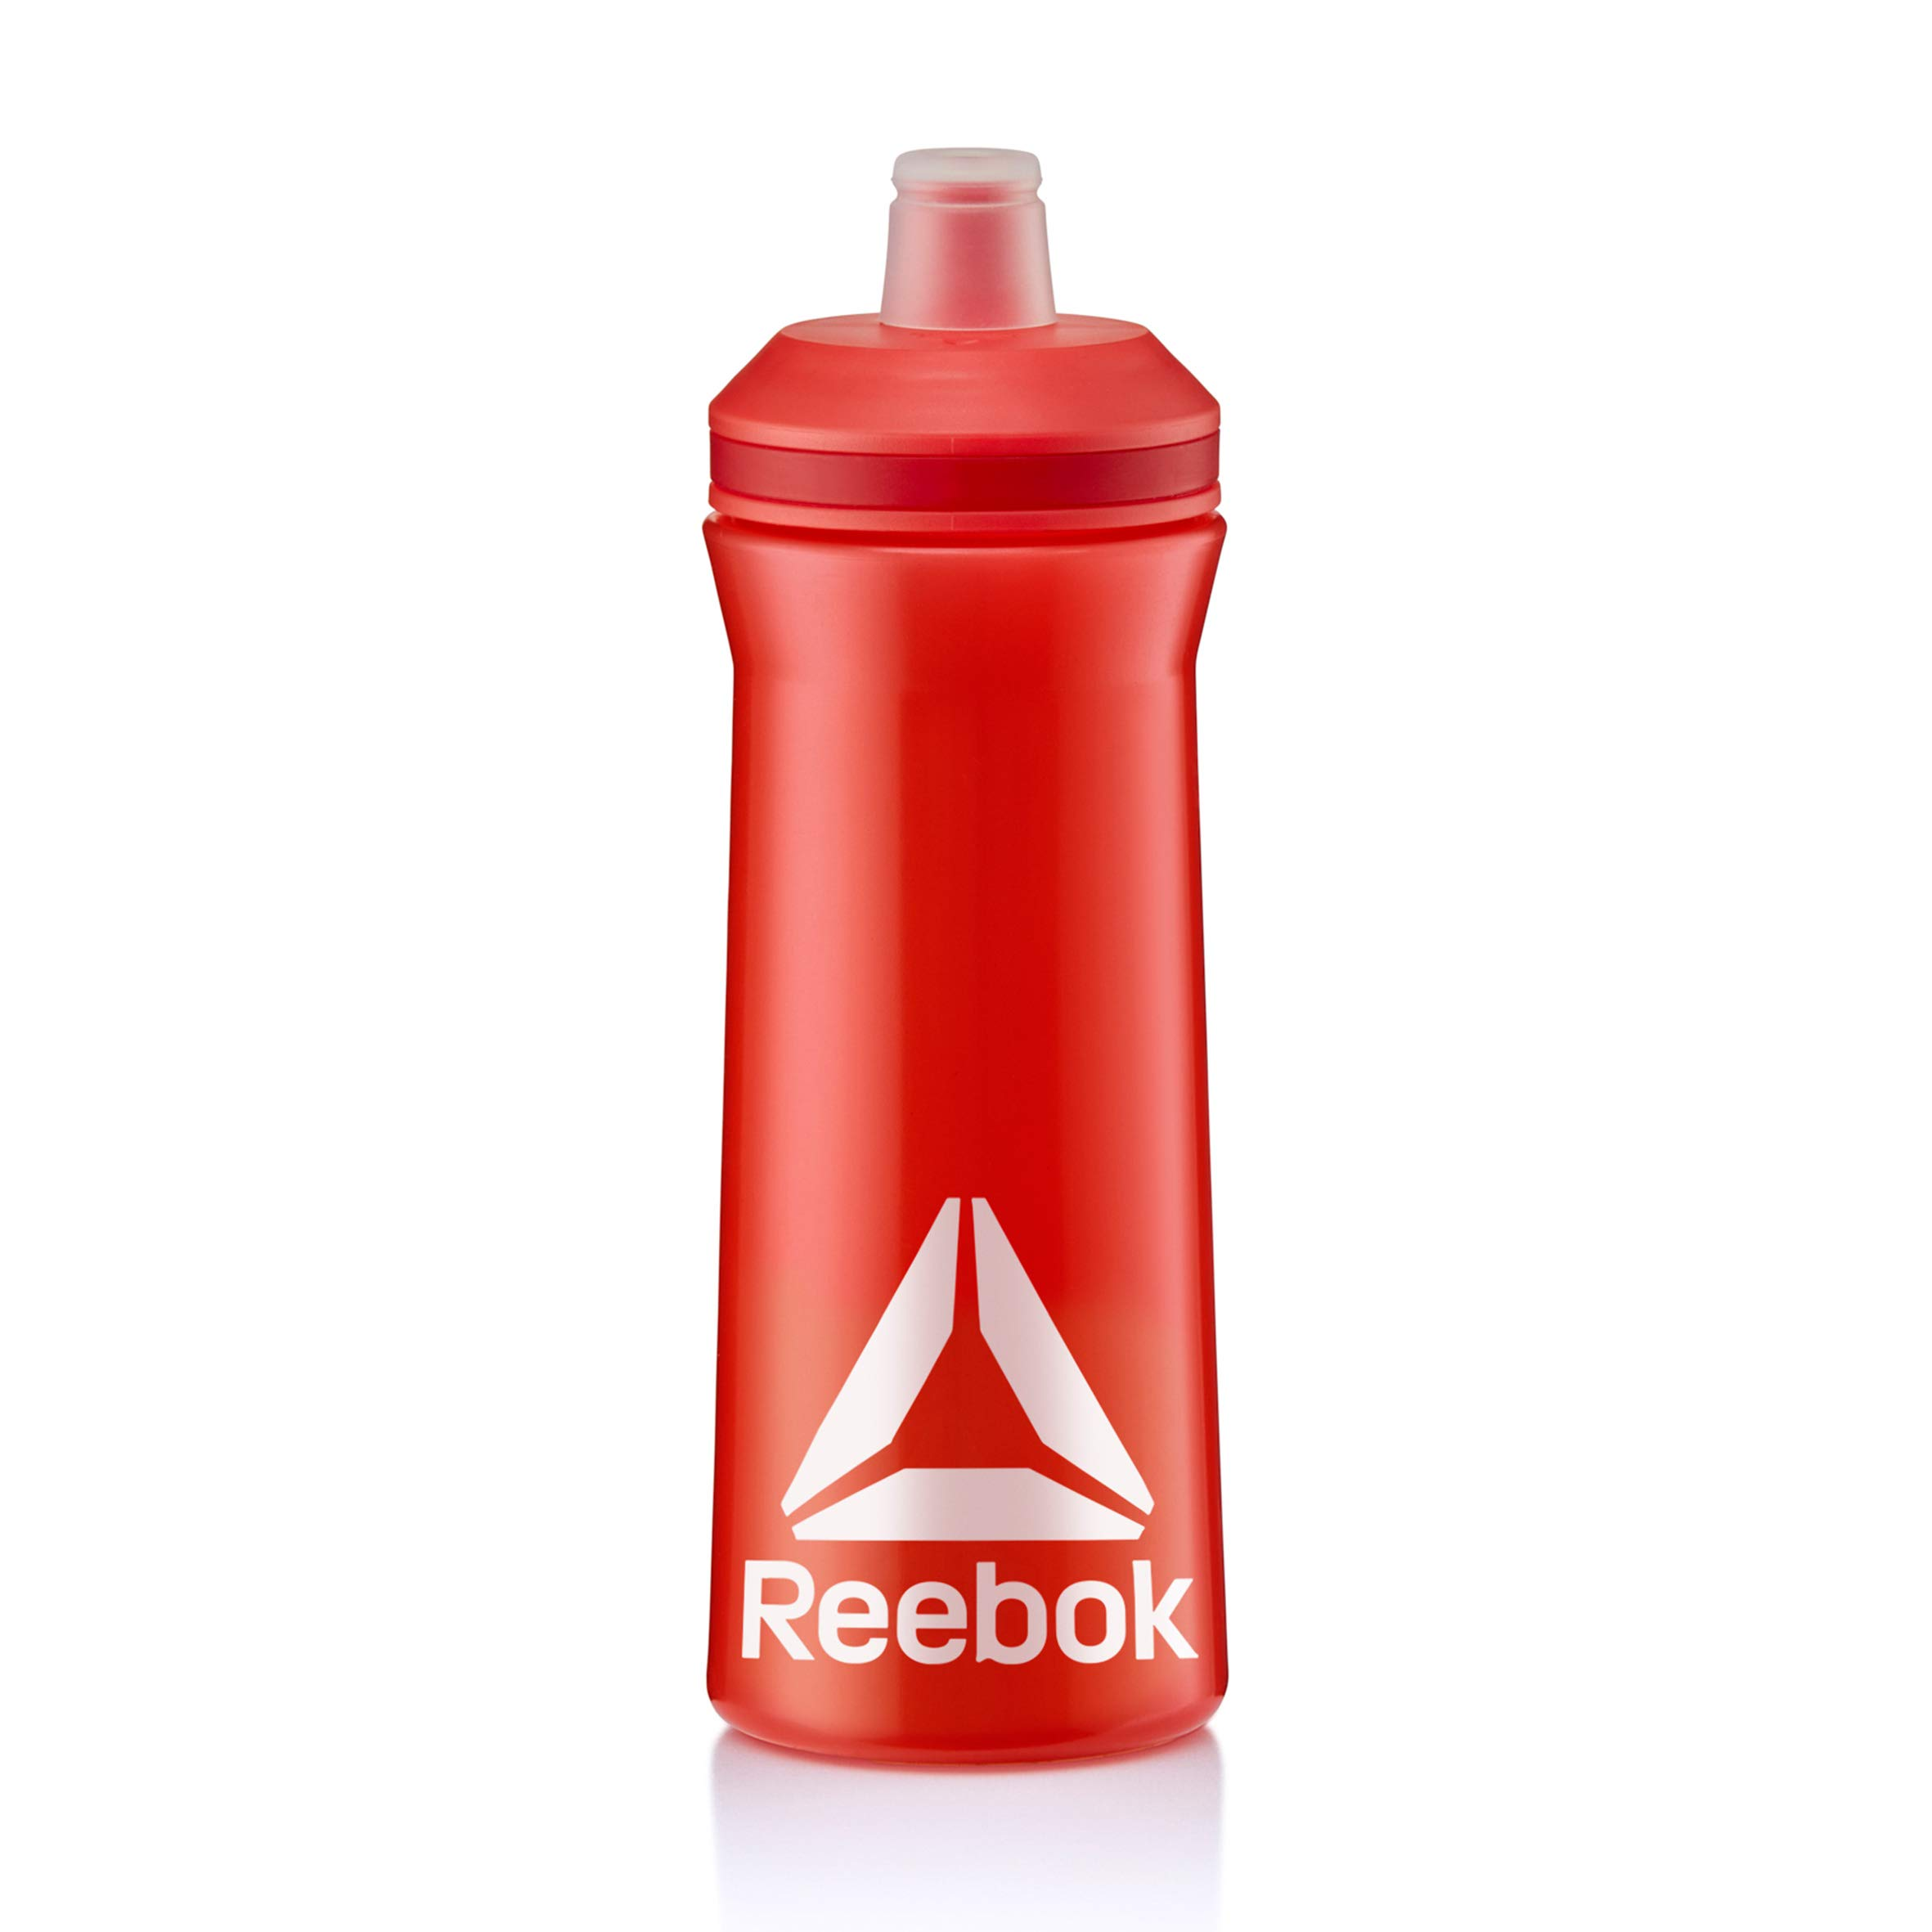 Reebok Trinkflasche, Rot, 500ml